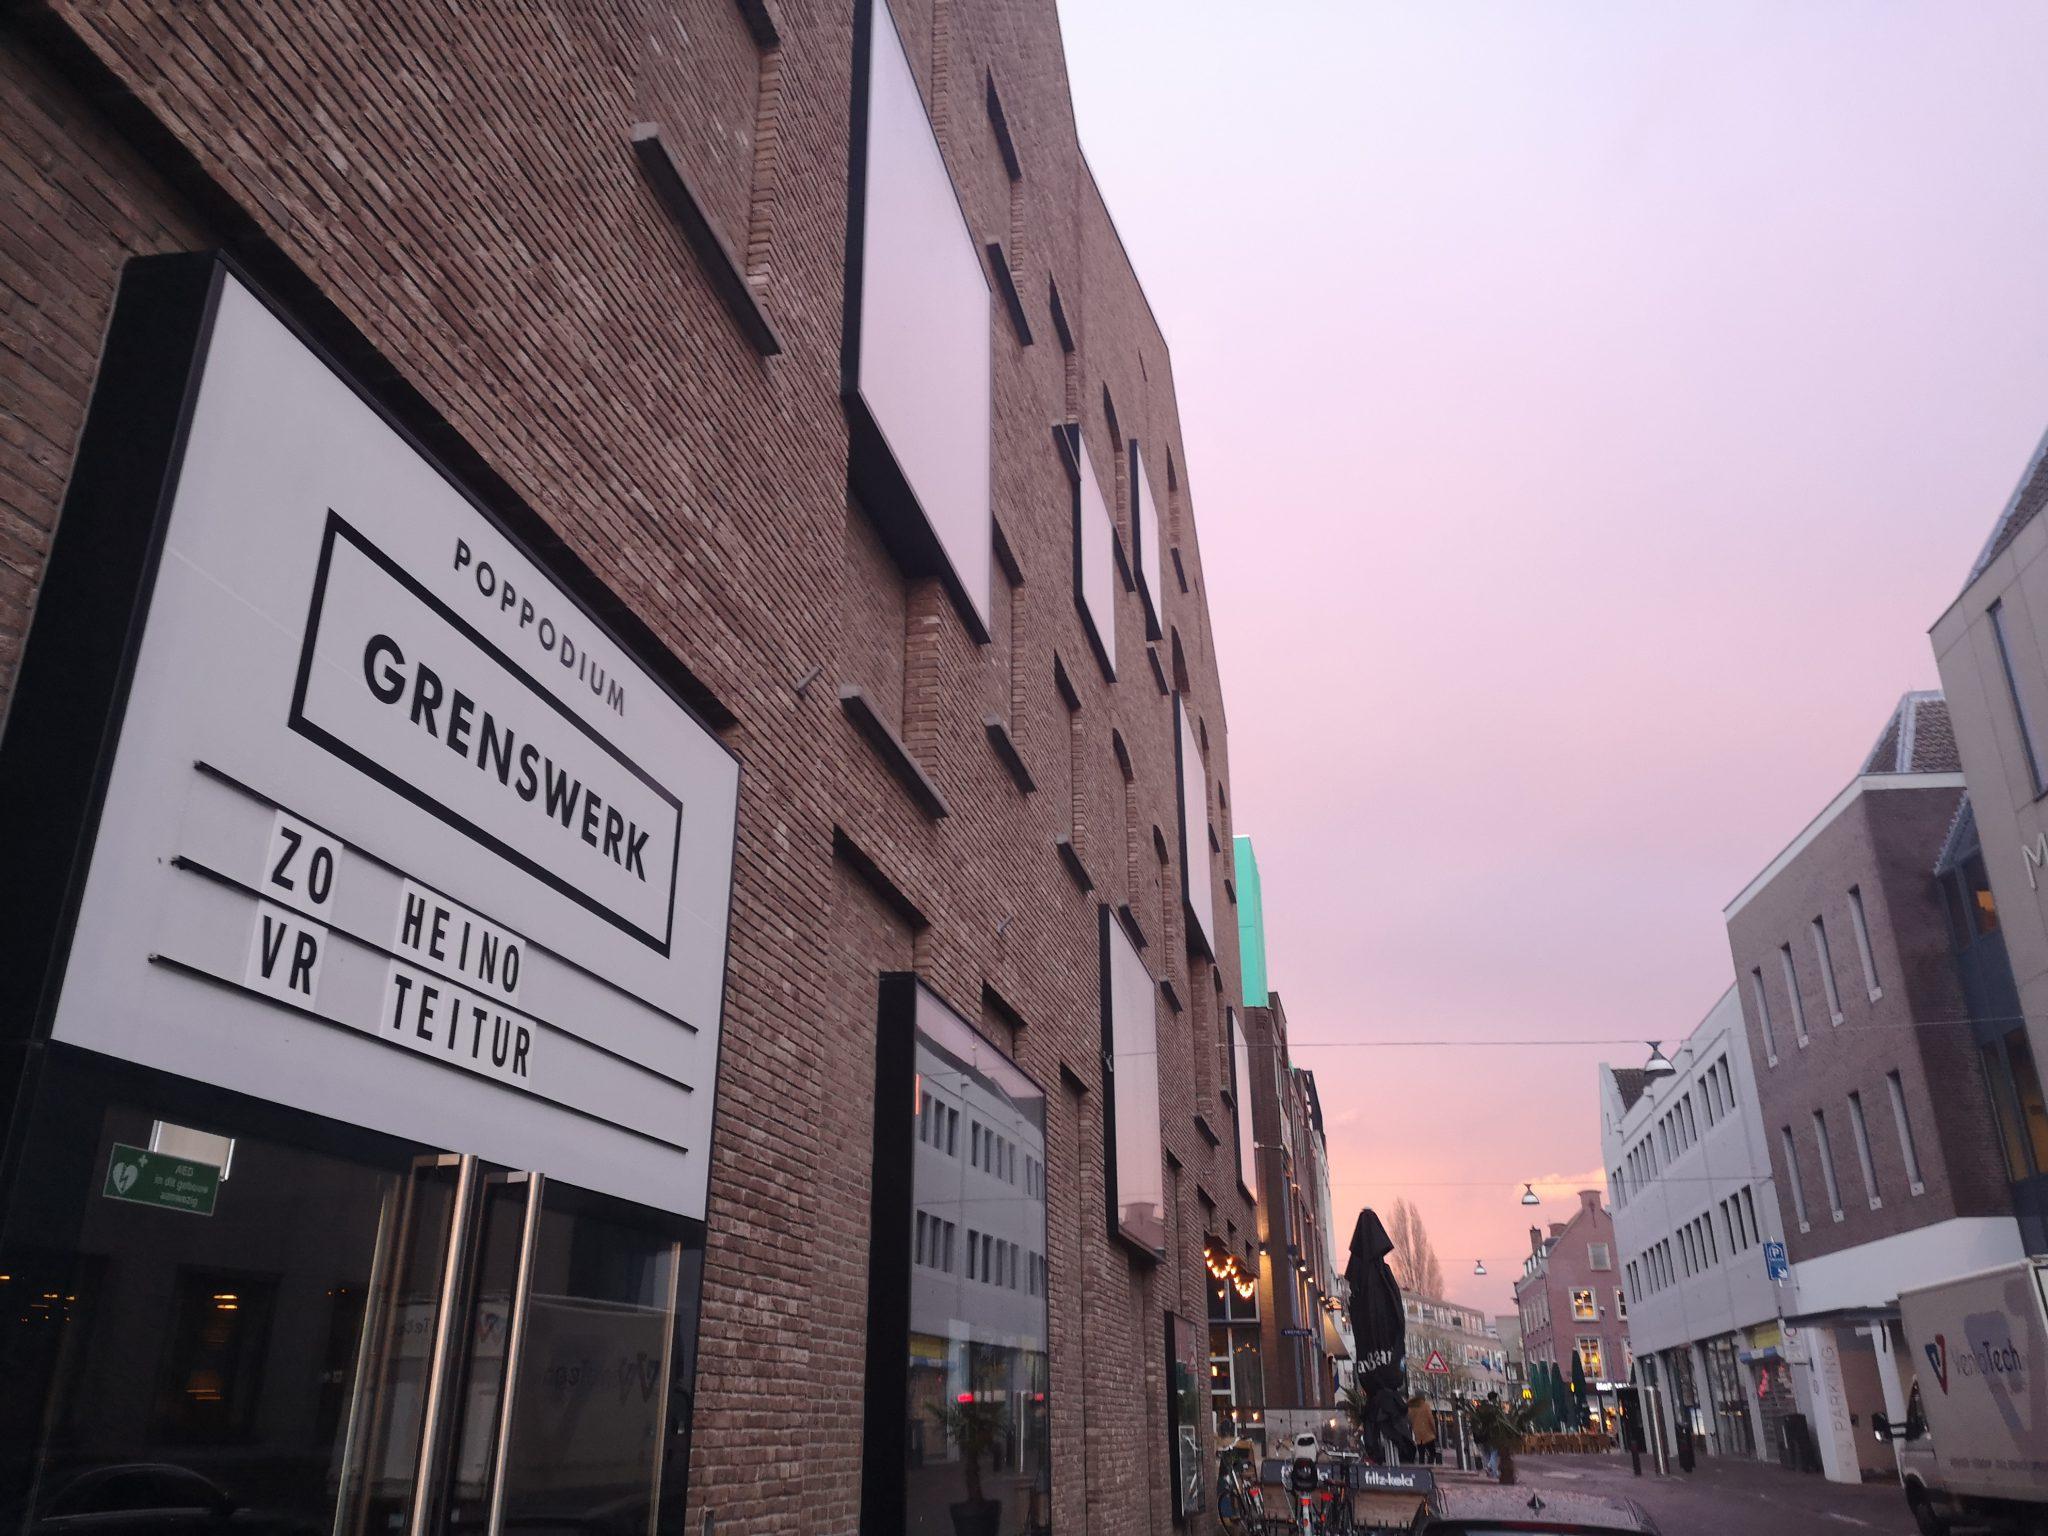 Heino vs. Teitur im Grenswerk Venlo.